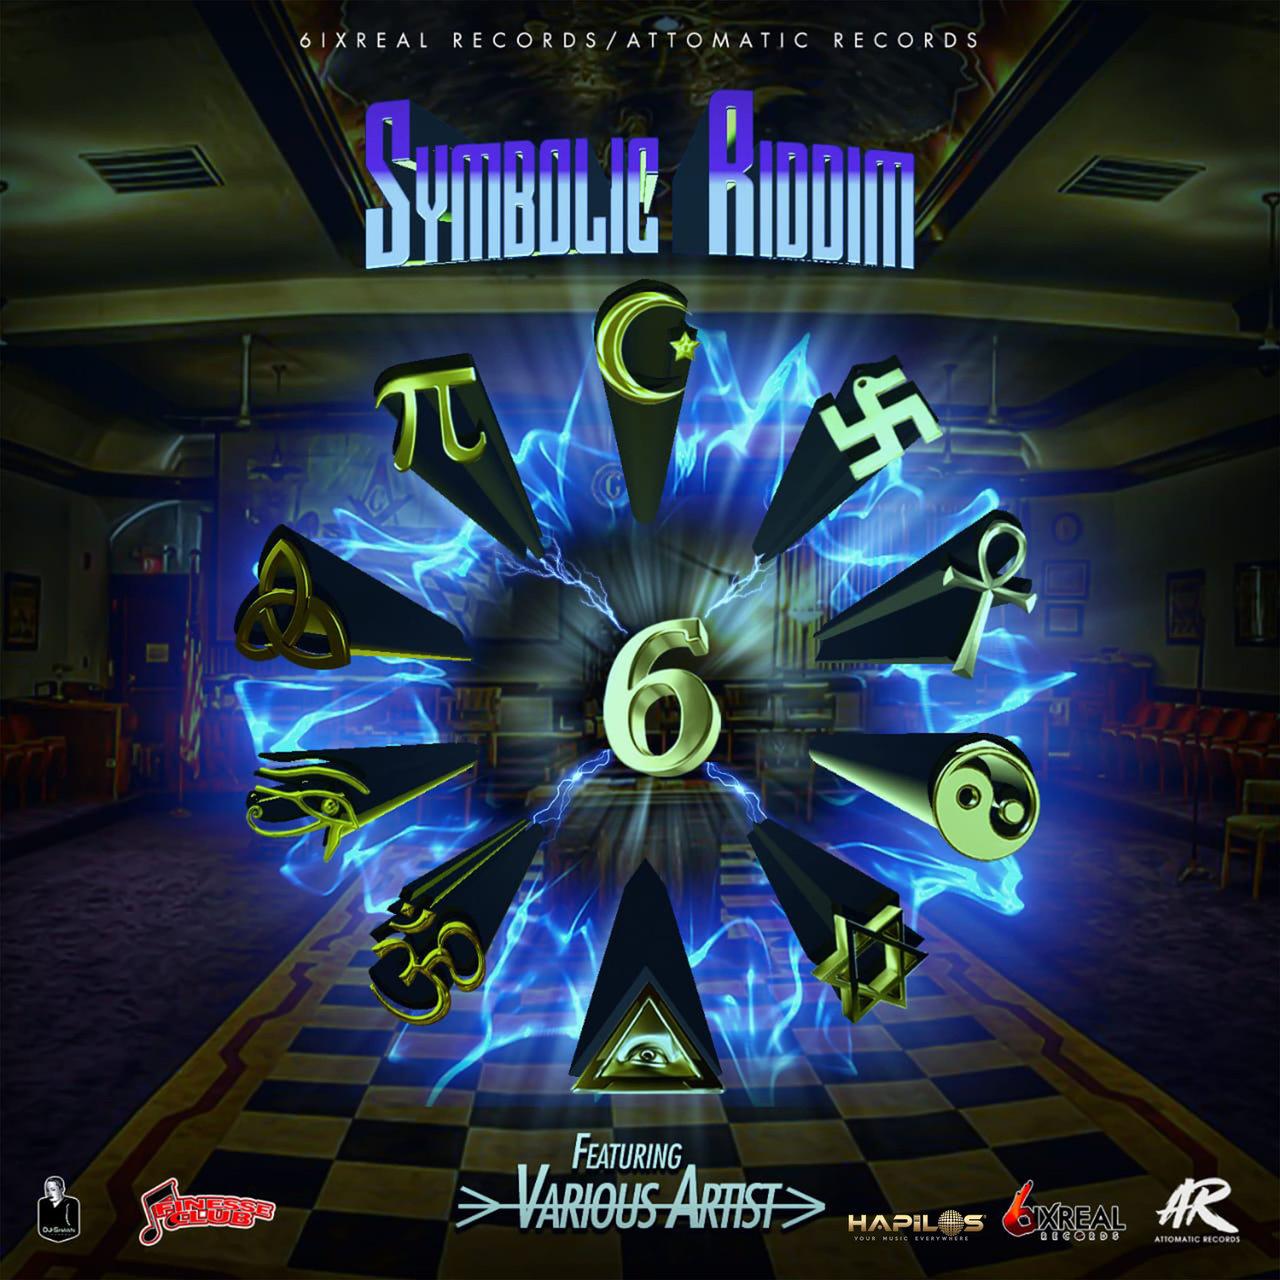 Symbolic Riddim (Cover)